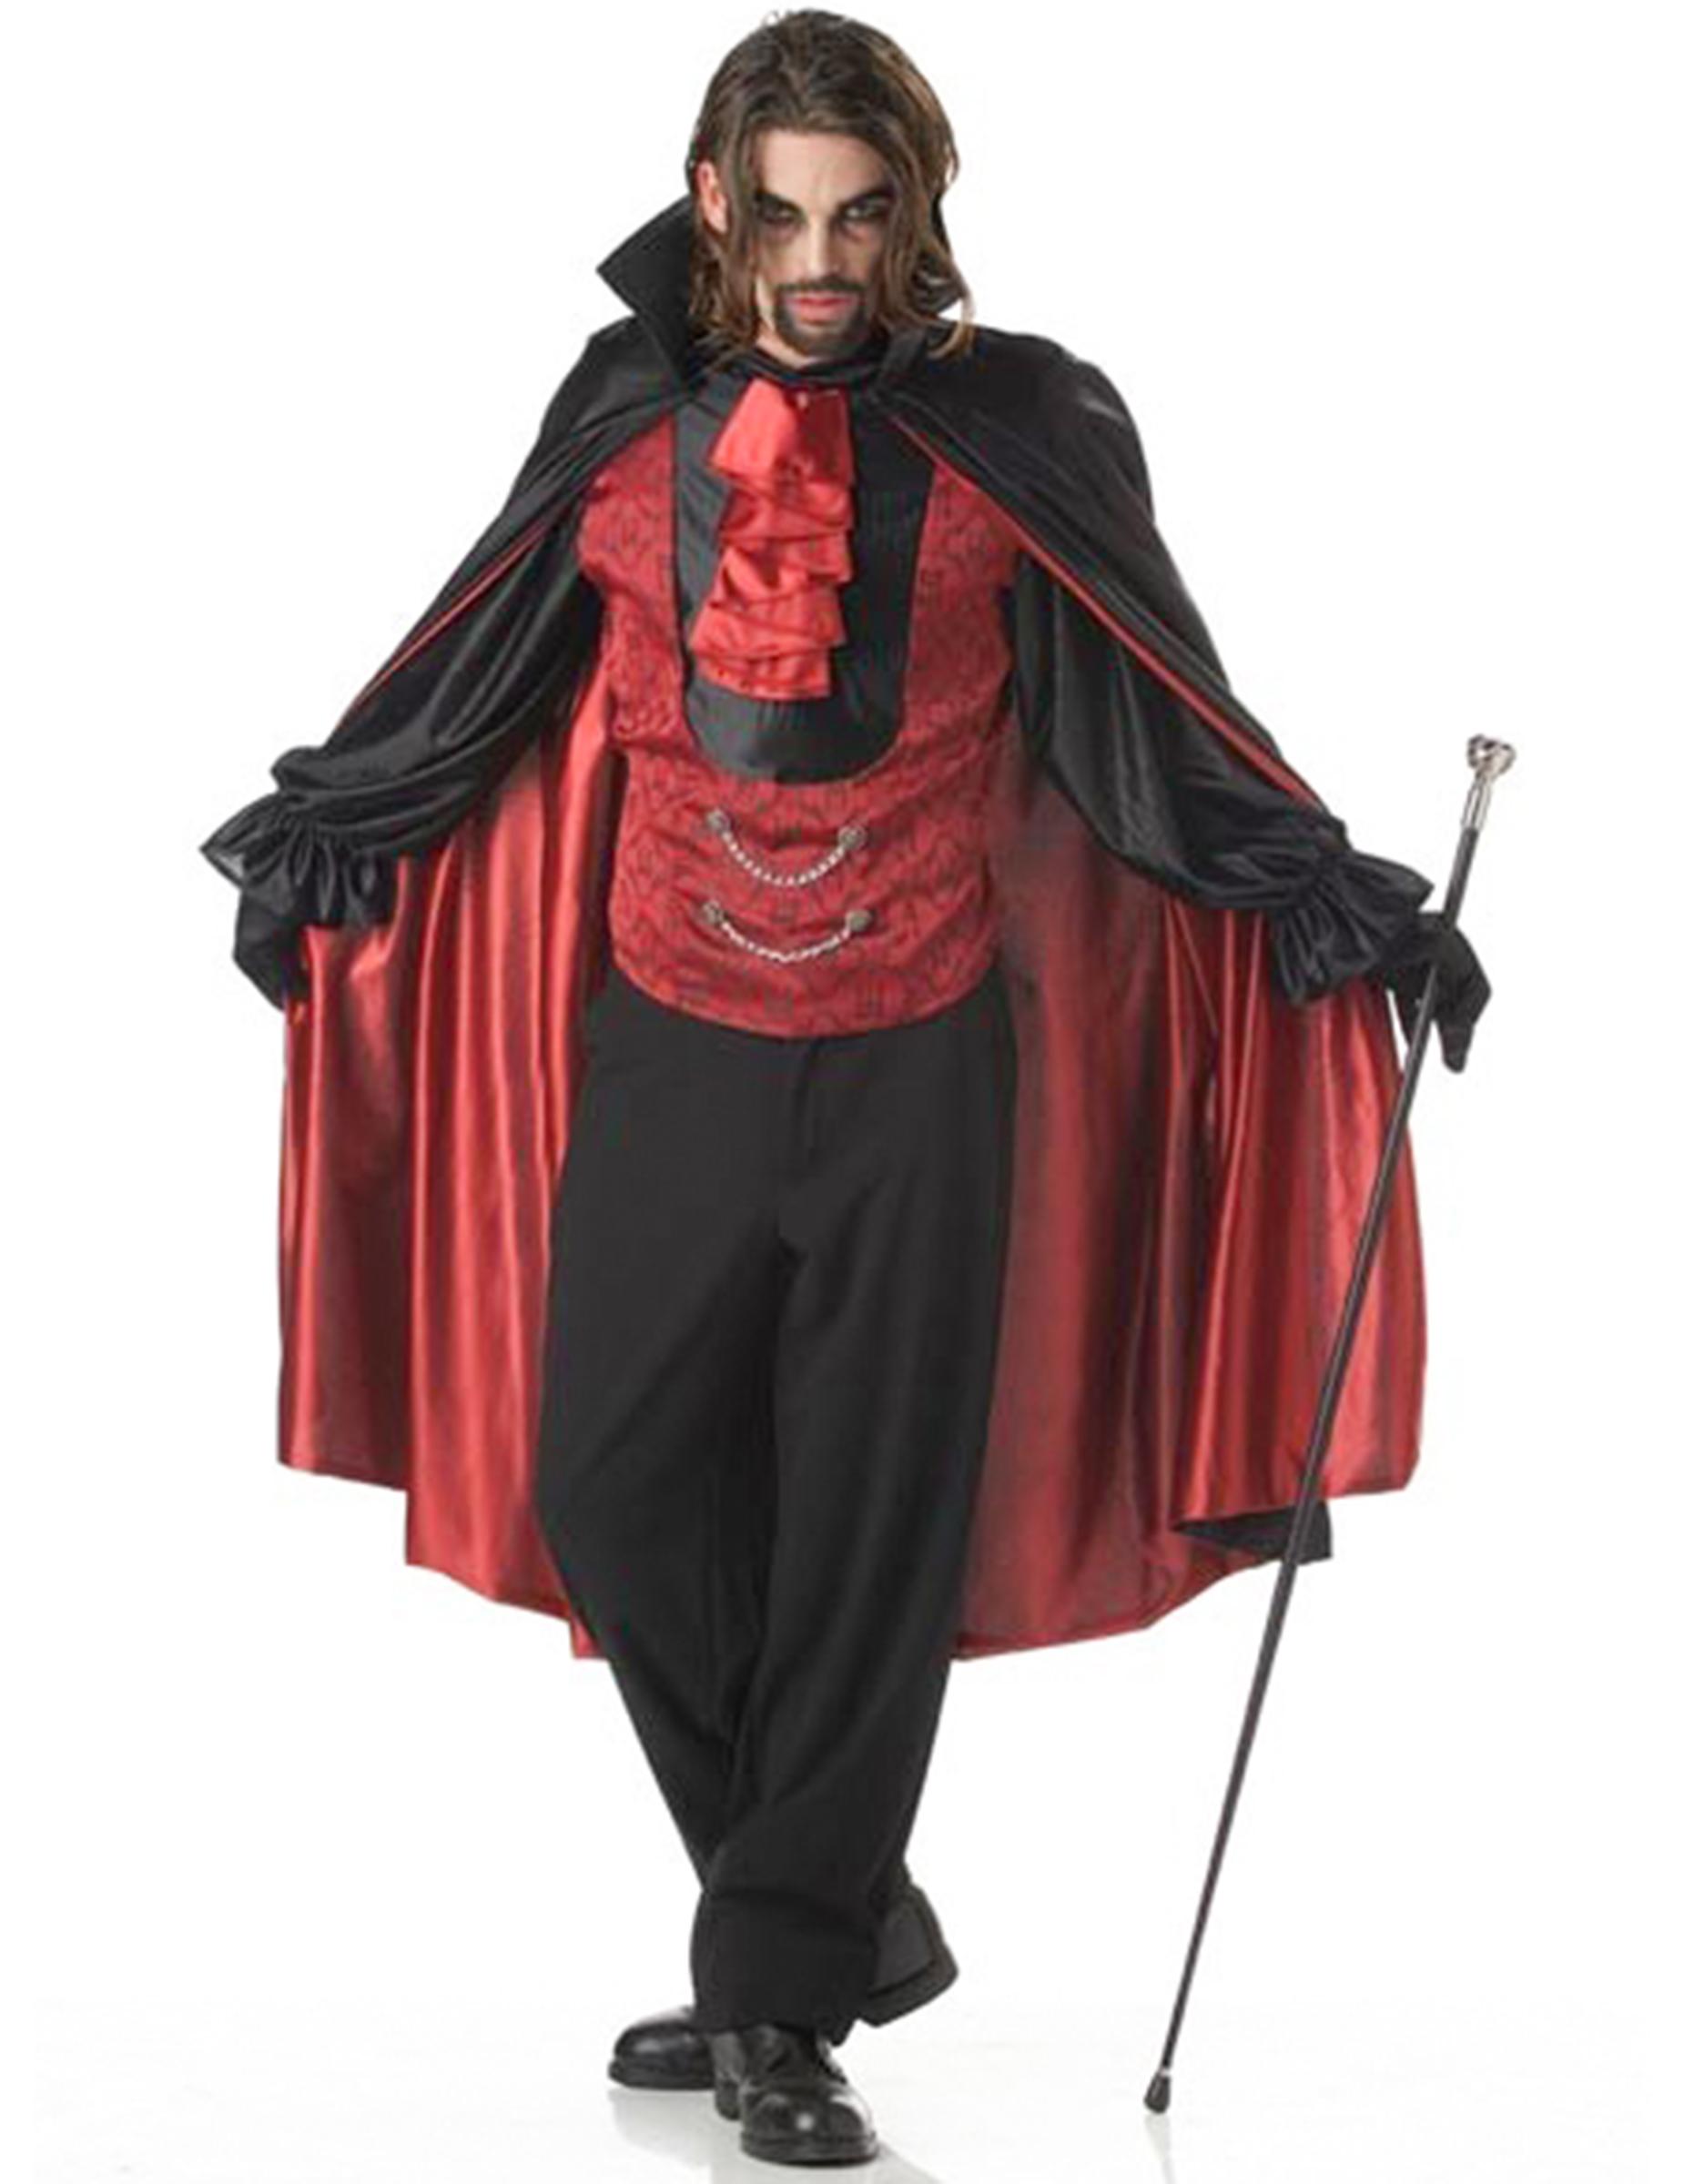 prinz der dunkelheit vampir kost m rot schwarz kost me. Black Bedroom Furniture Sets. Home Design Ideas